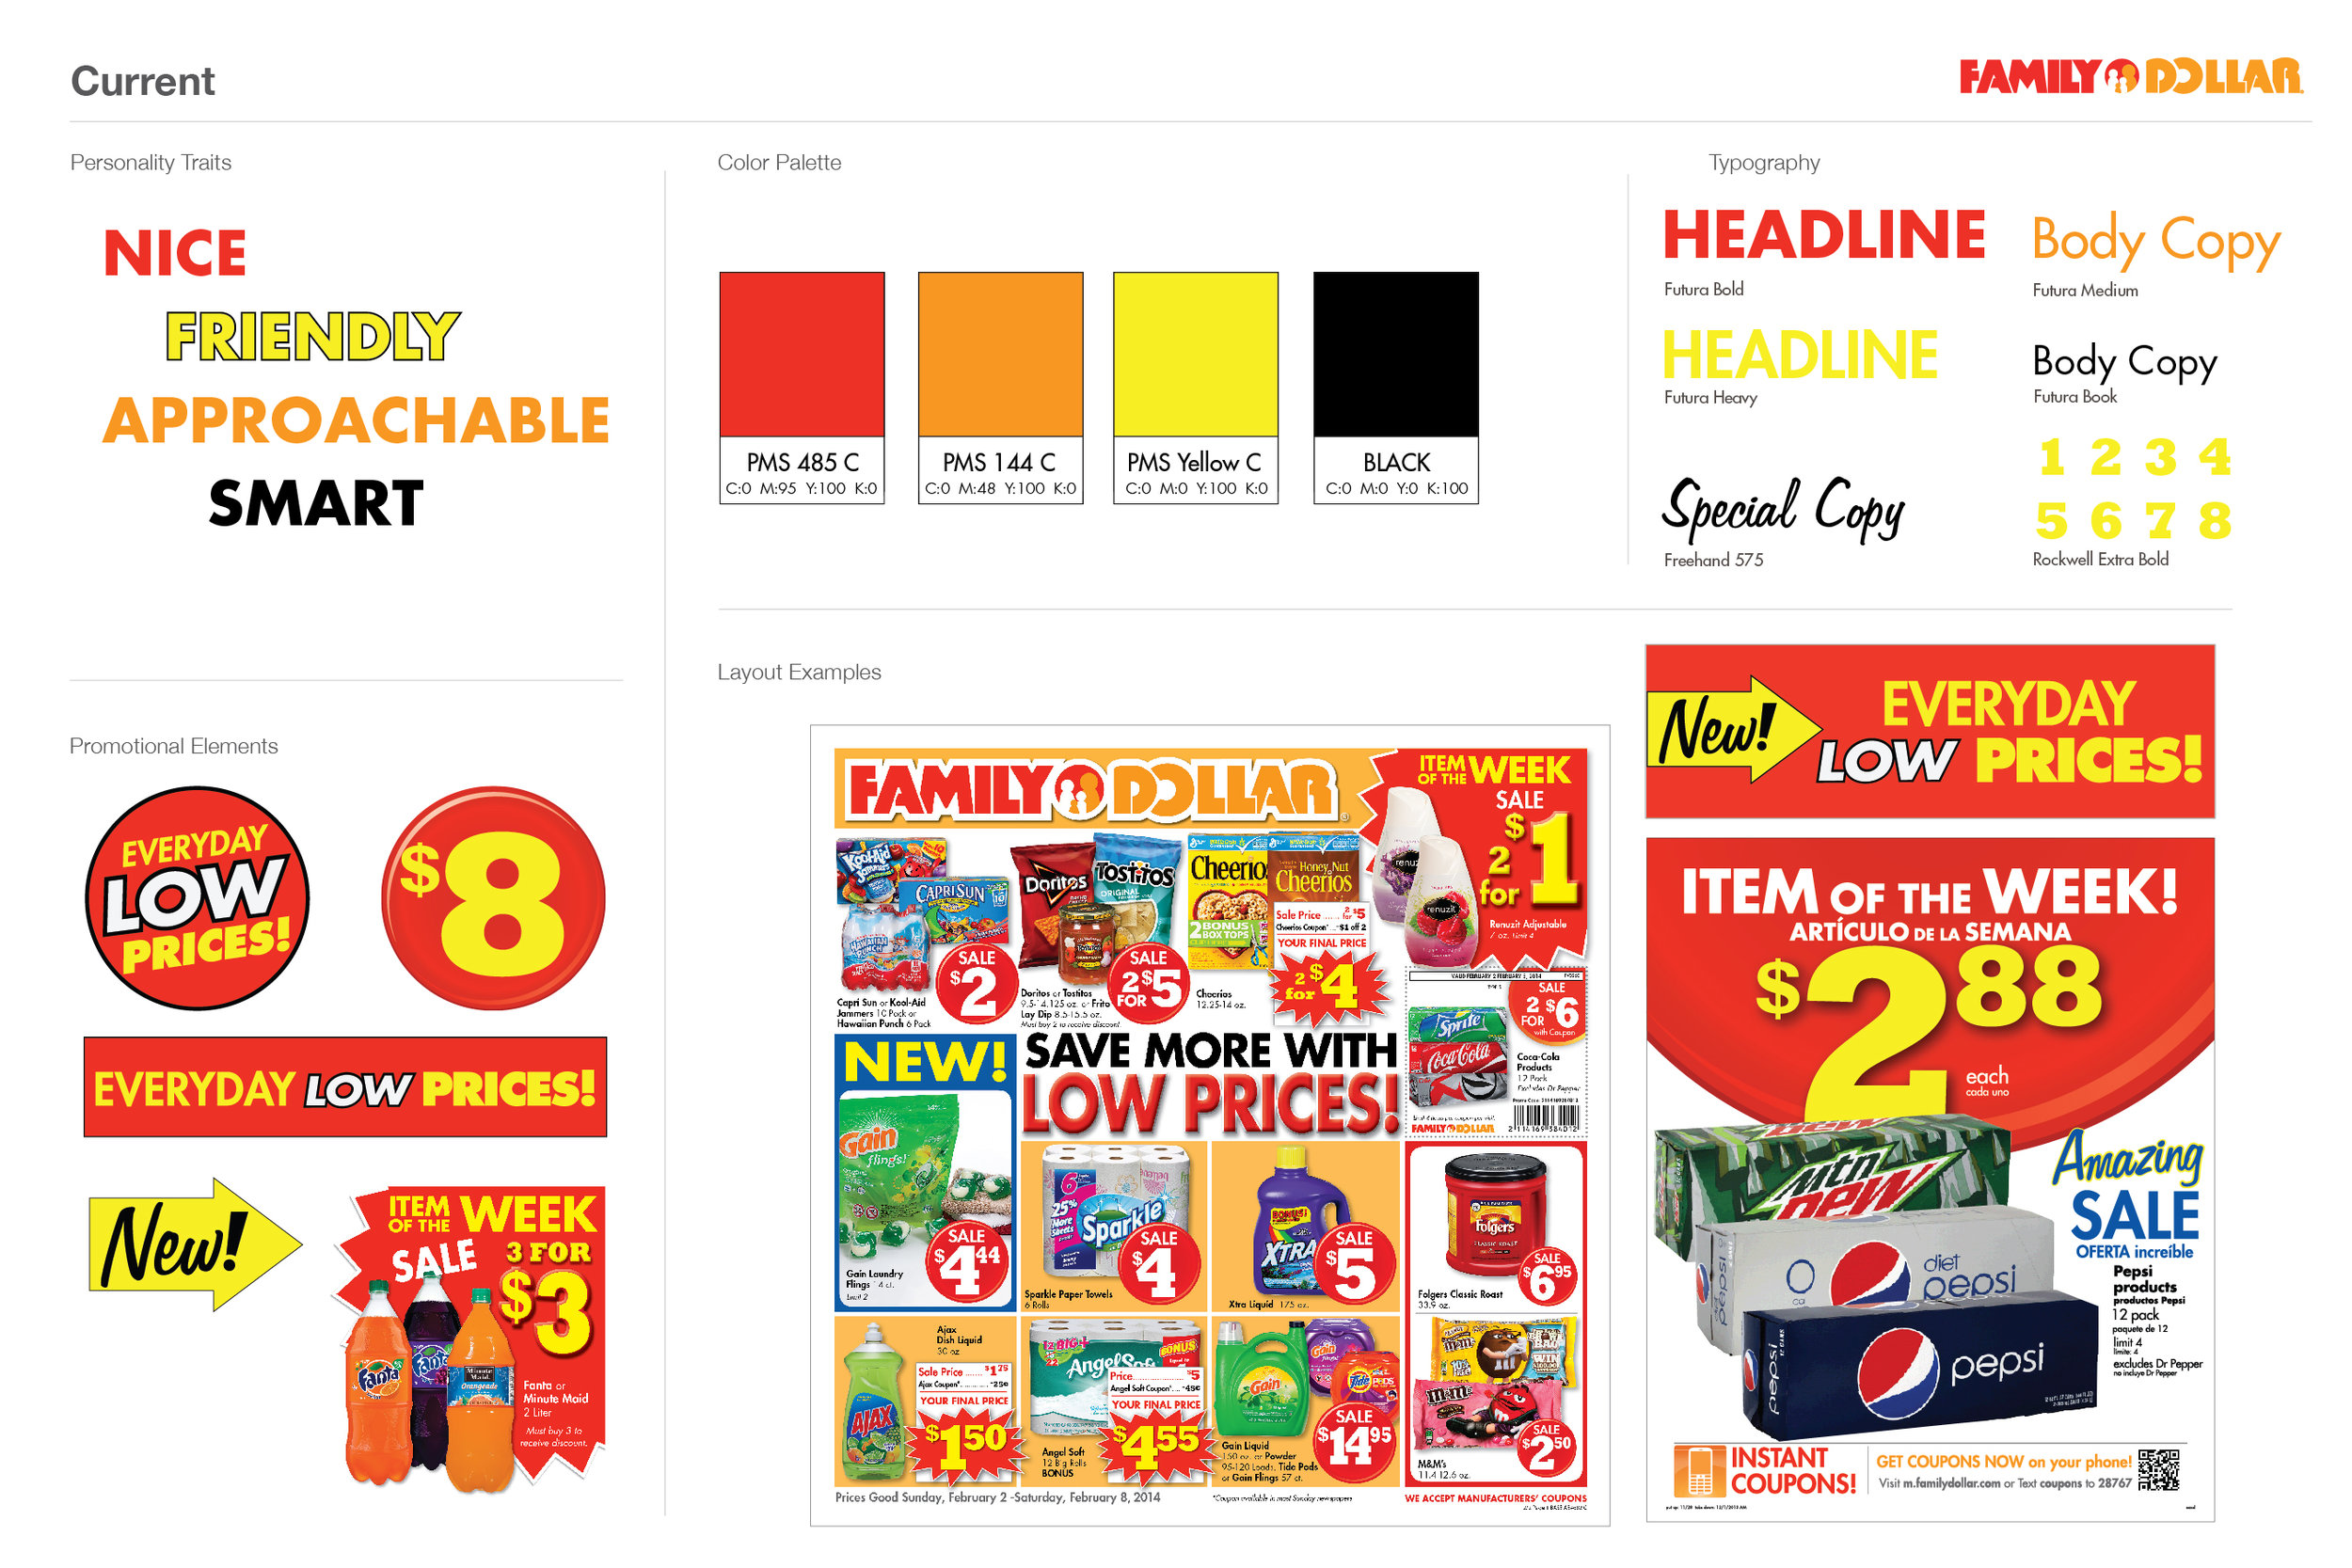 Original Family Dollar Brand Elements